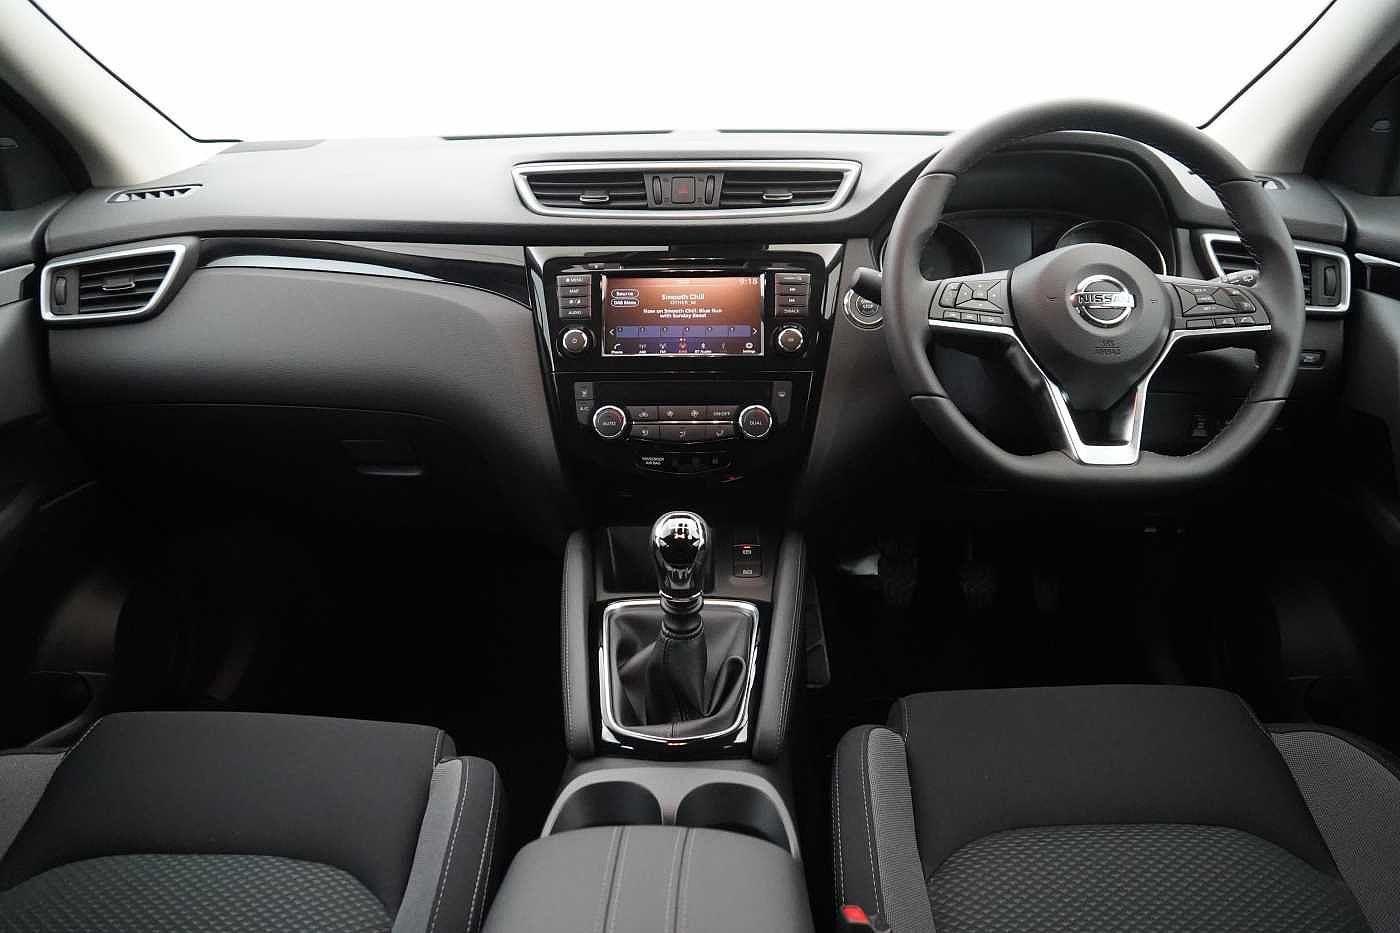 Nissan Qashqai for sale